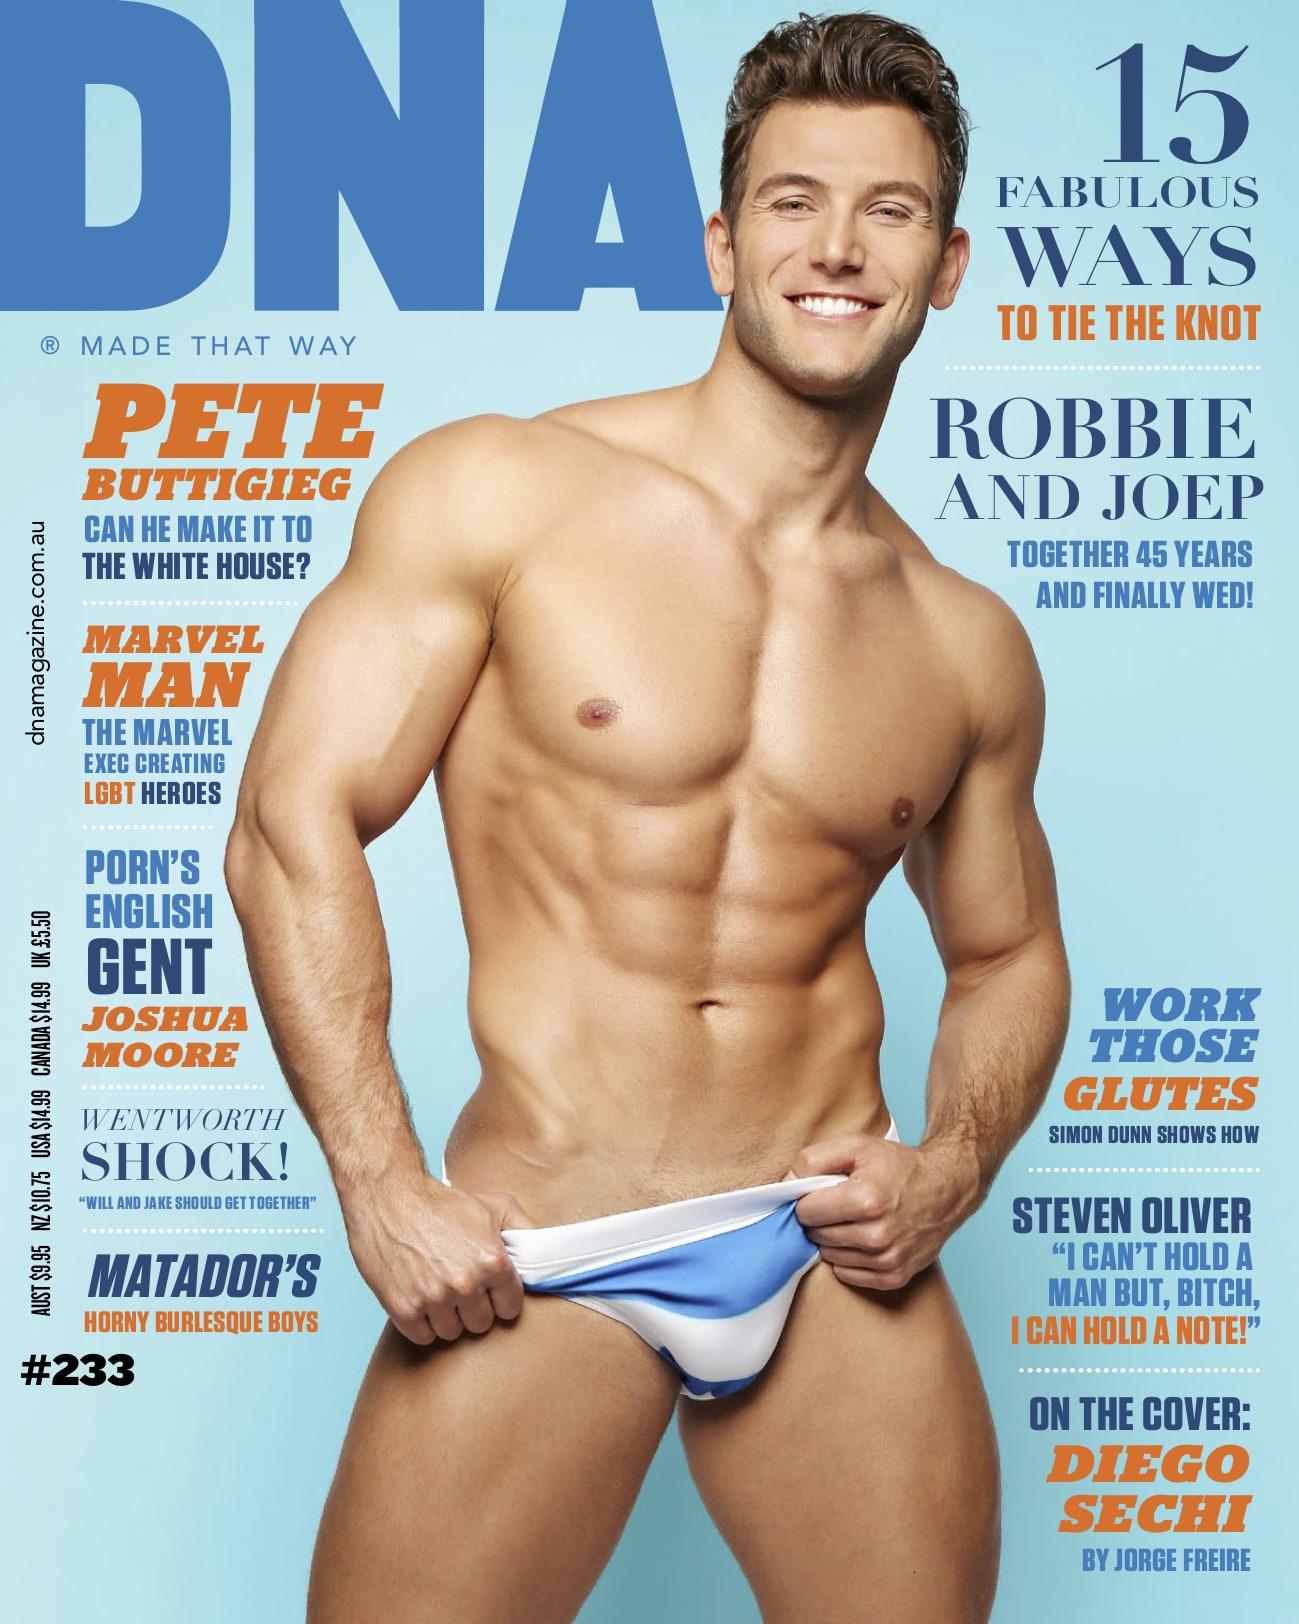 Dna Gay Porn Magazine